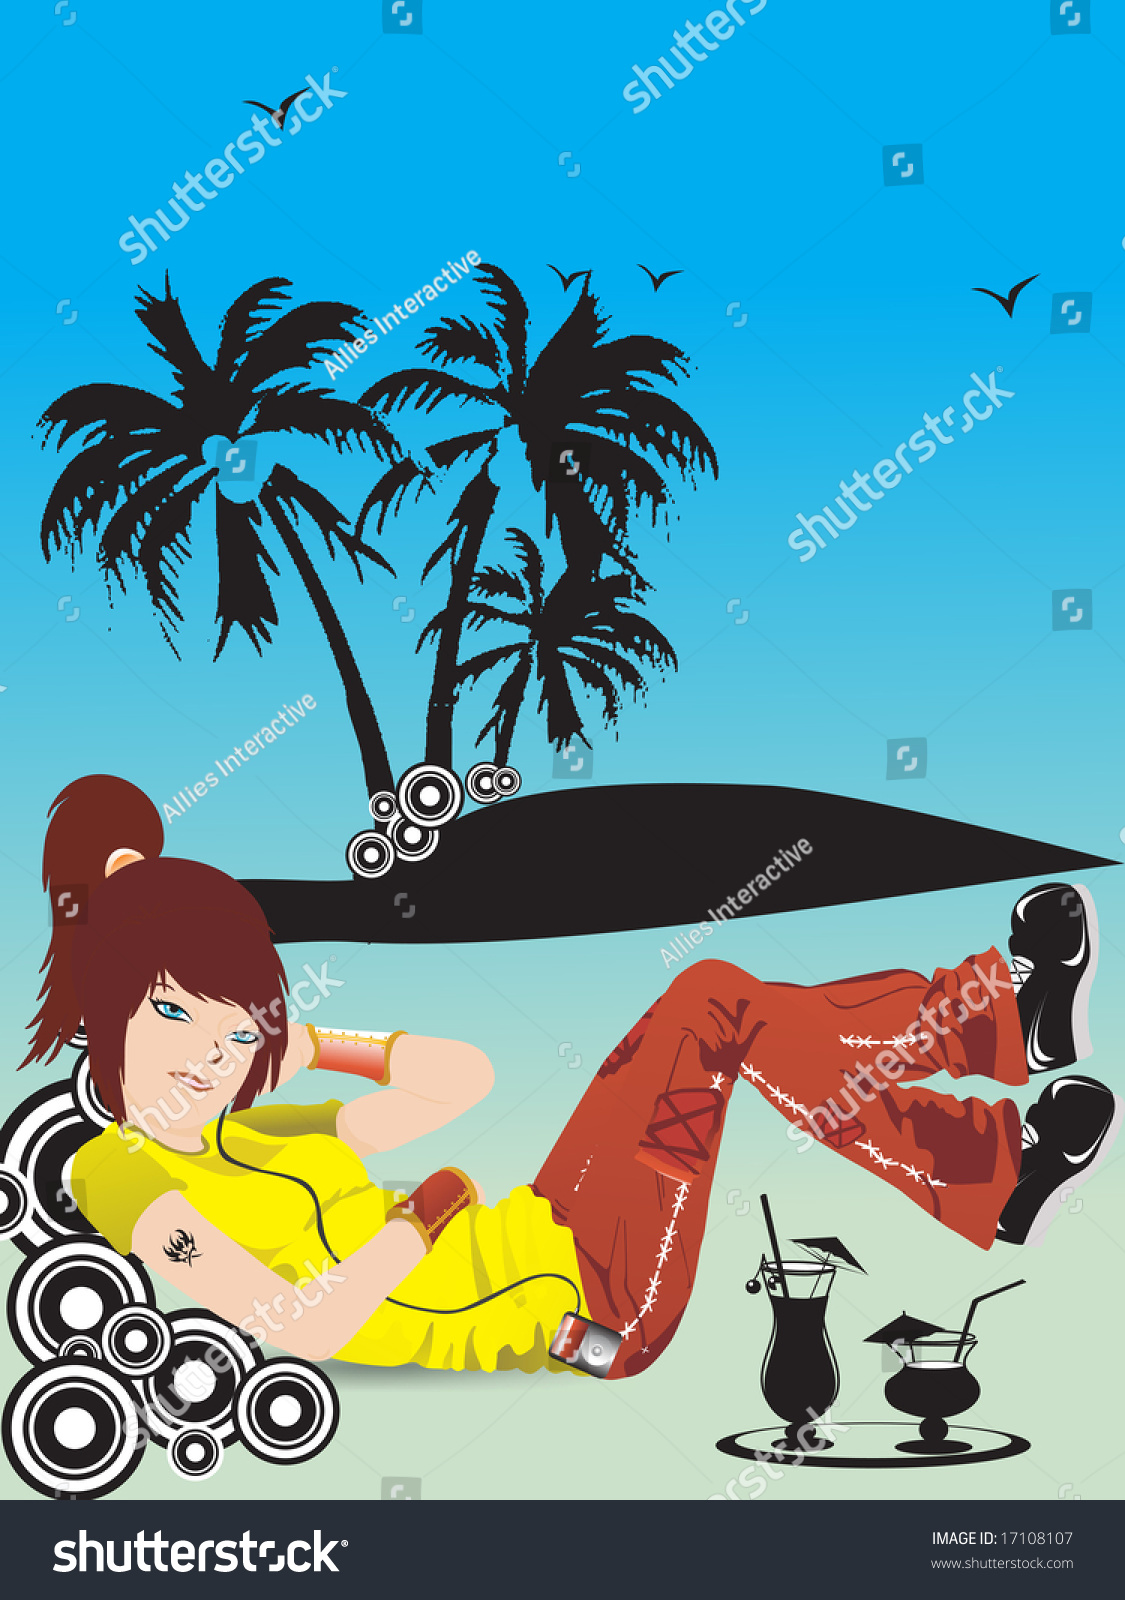 Simple Wallpaper Music Summer - stock-vector-beautiful-girl-listening-music-on-summer-background-wallpaper-17108107  Picture_93785.jpg